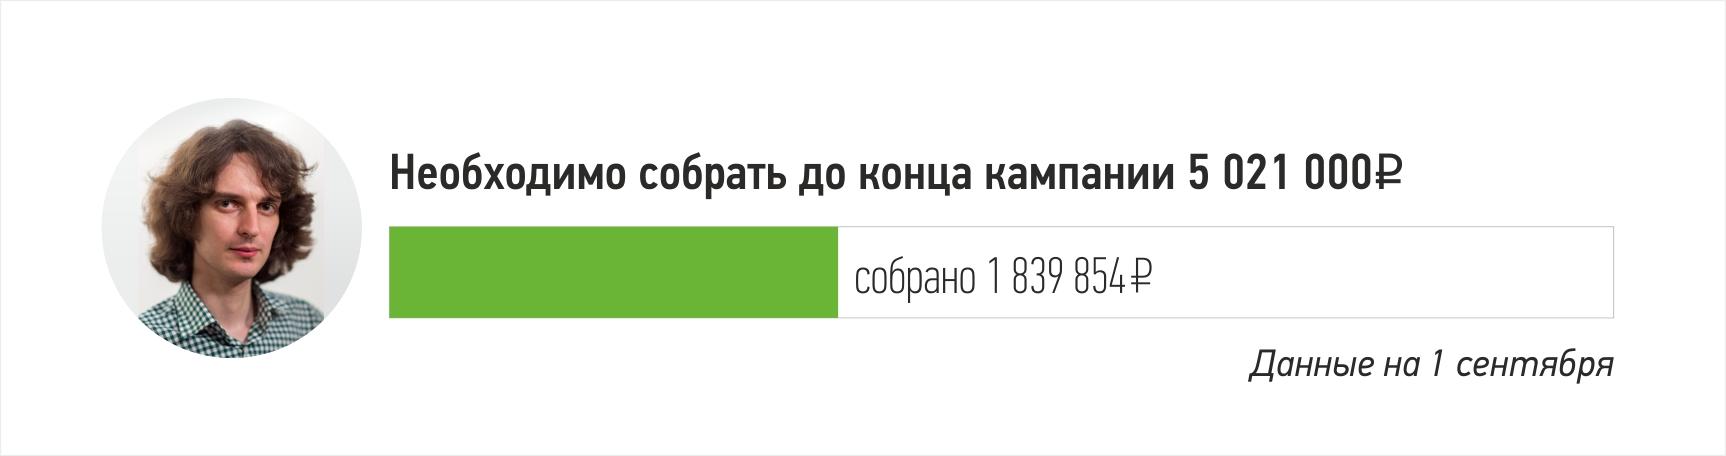 soroka_1sep